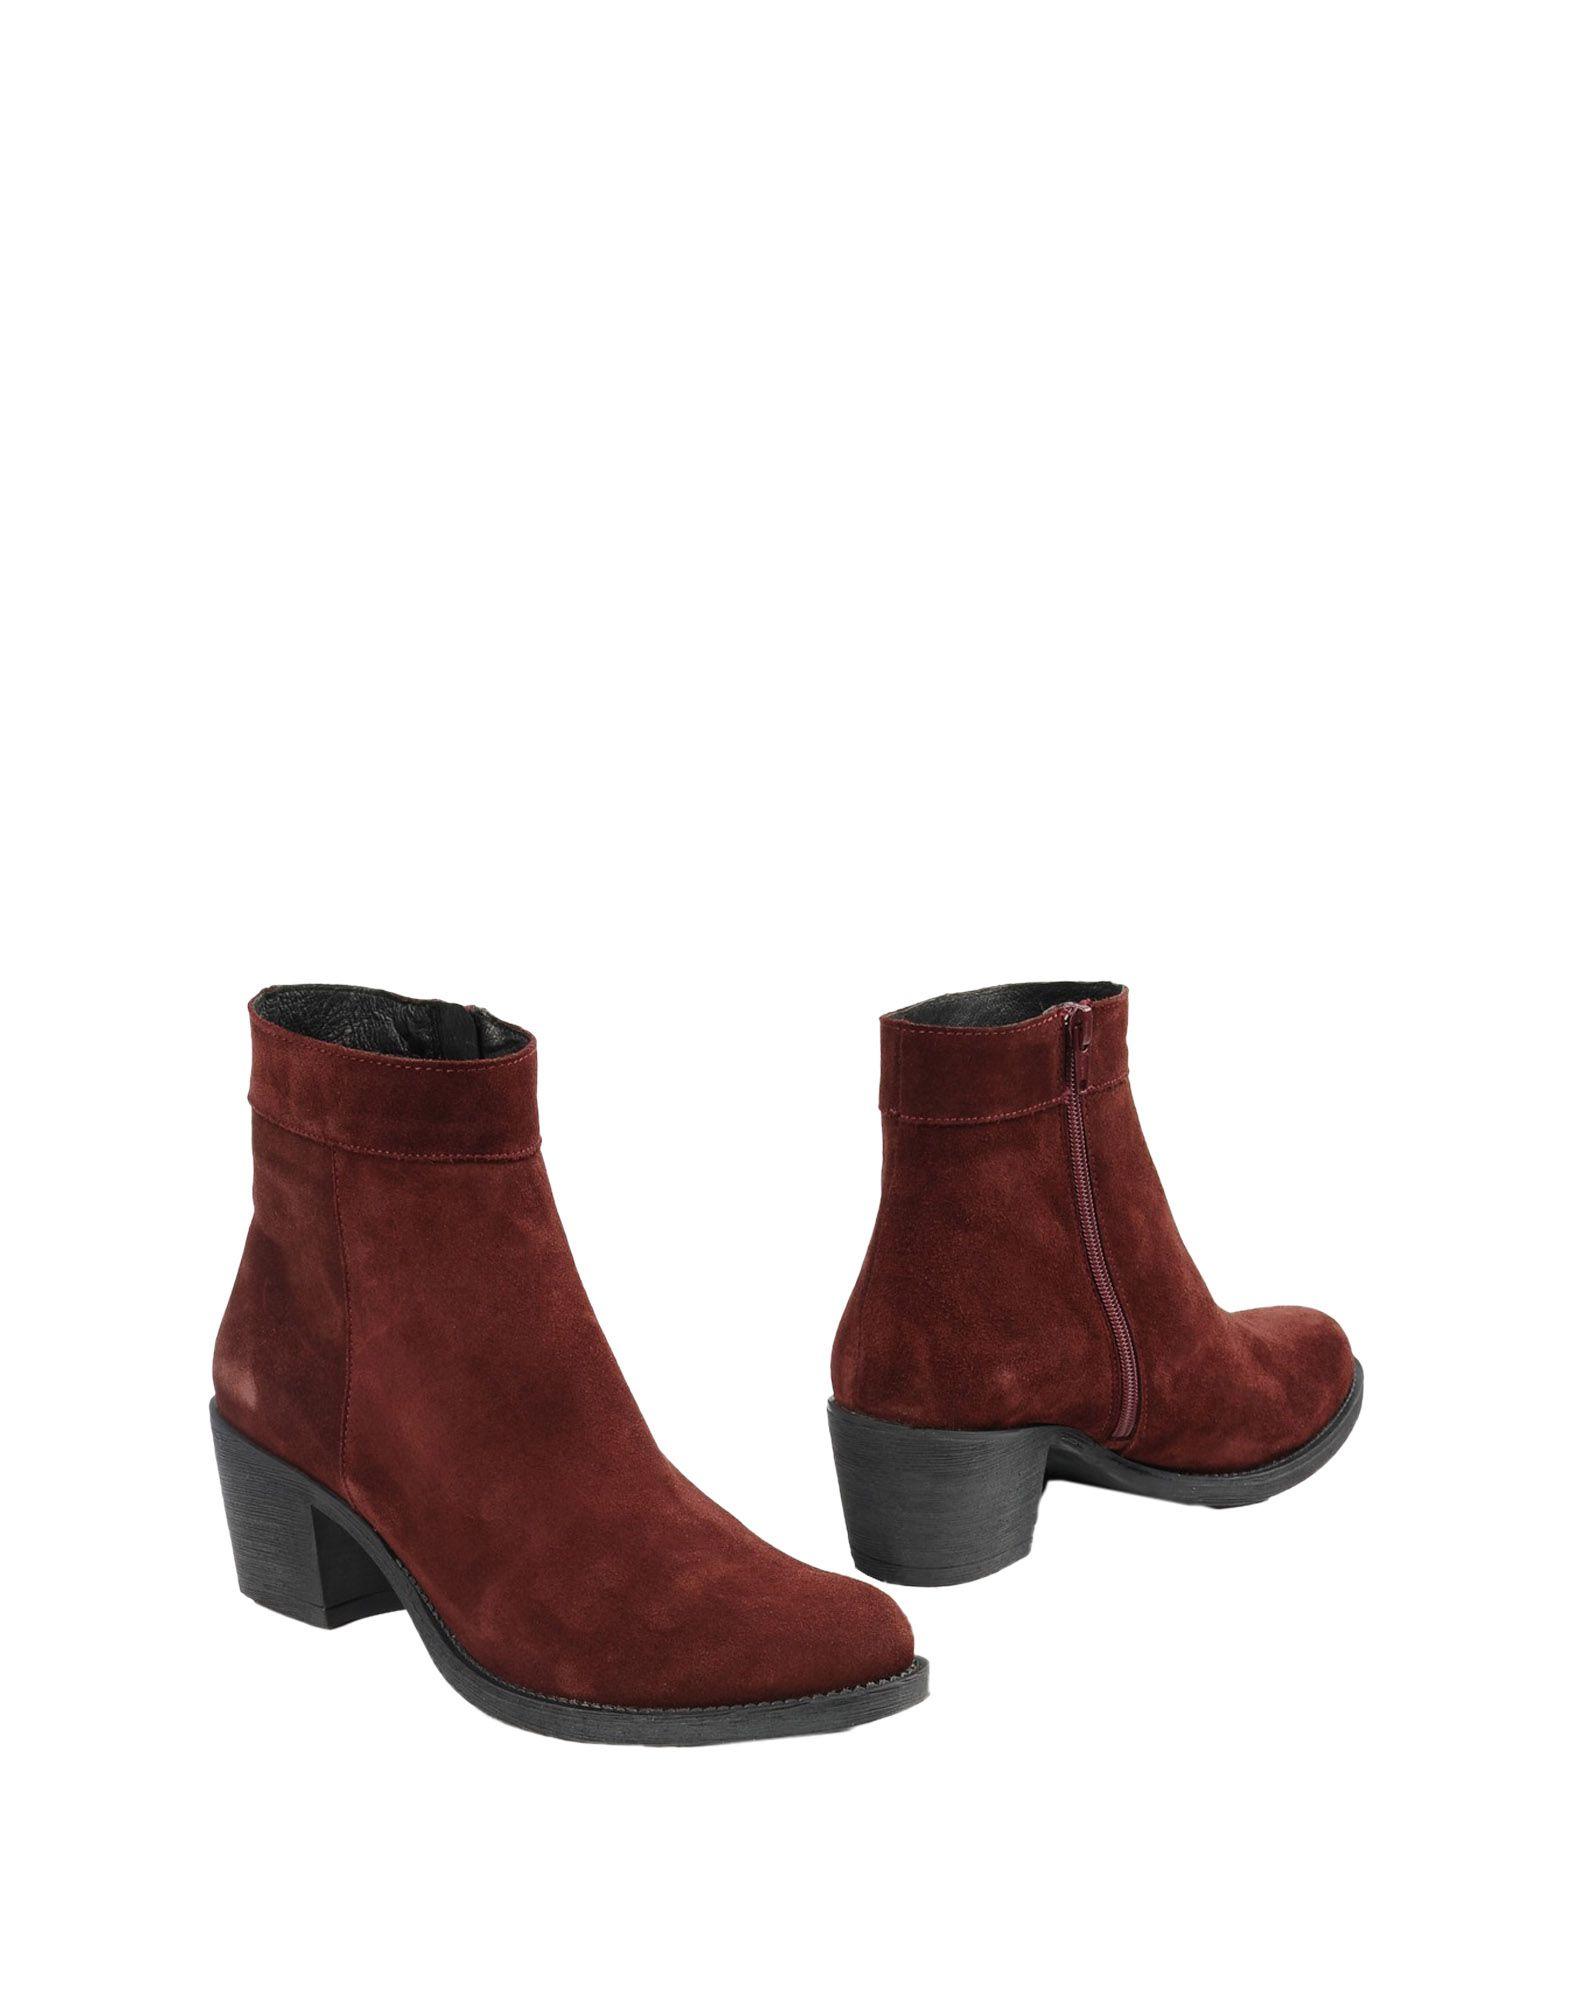 Maison Shoeshibar Stiefelette Damen  11361251RP Gute Qualität beliebte Schuhe